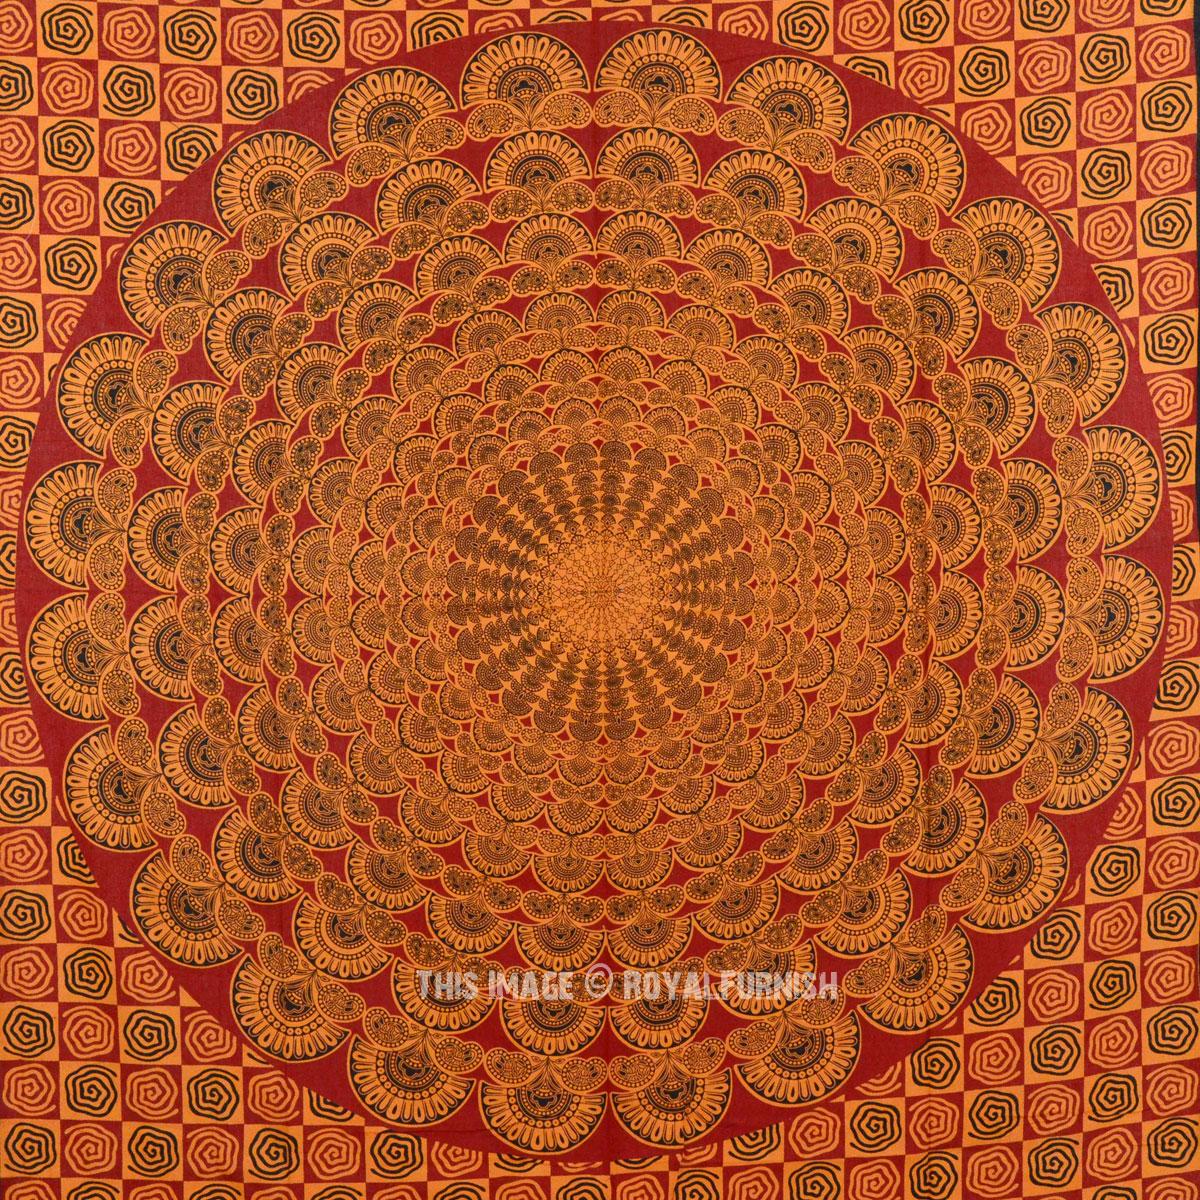 Small Red Peacock Wings Mandala Wall Tapestry, Bohemian Bedding - RoyalFurnish.com